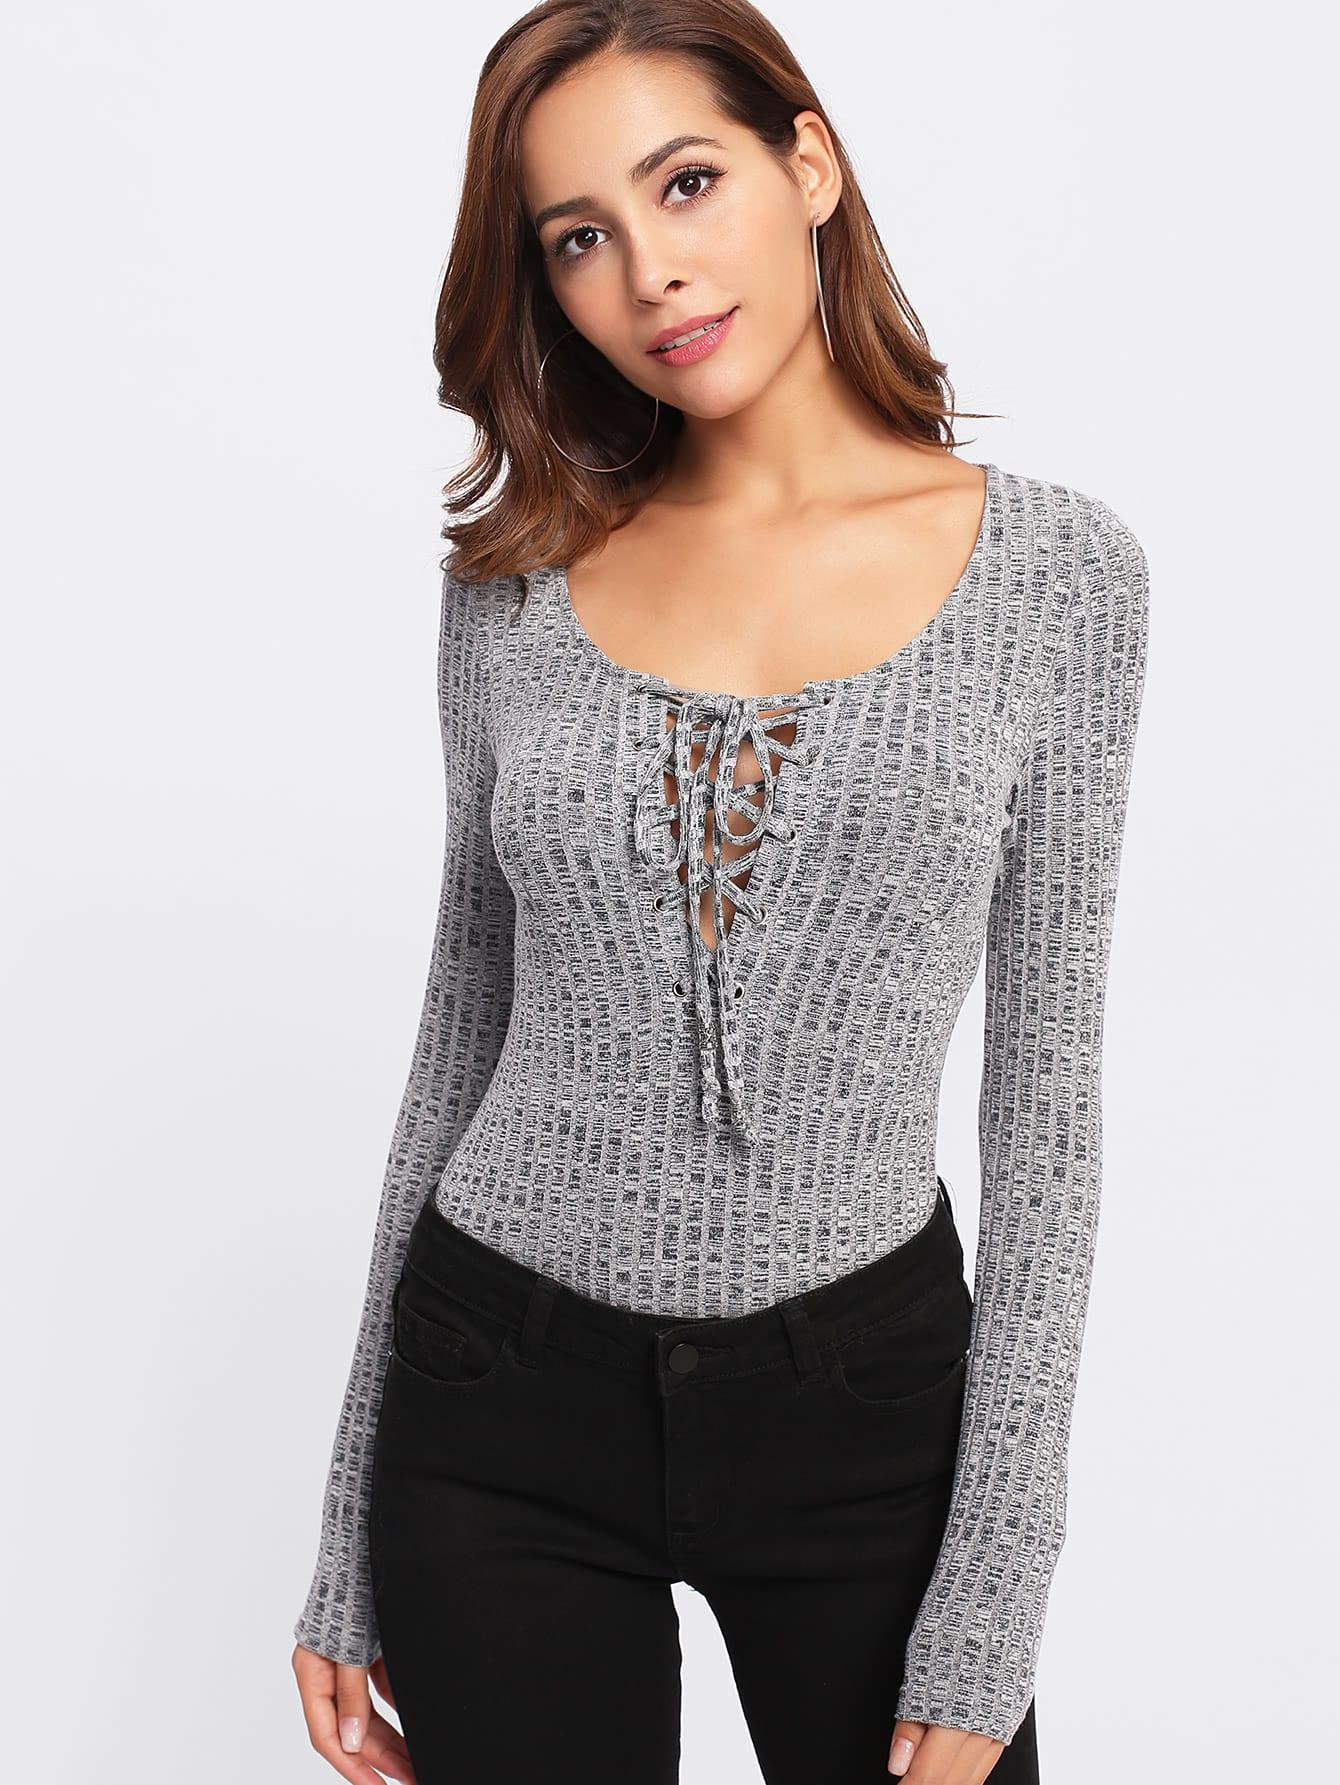 Eyelet Lace Up Rib Knit Marled Bodysuit ruffle trim rib knit strapless bodysuit